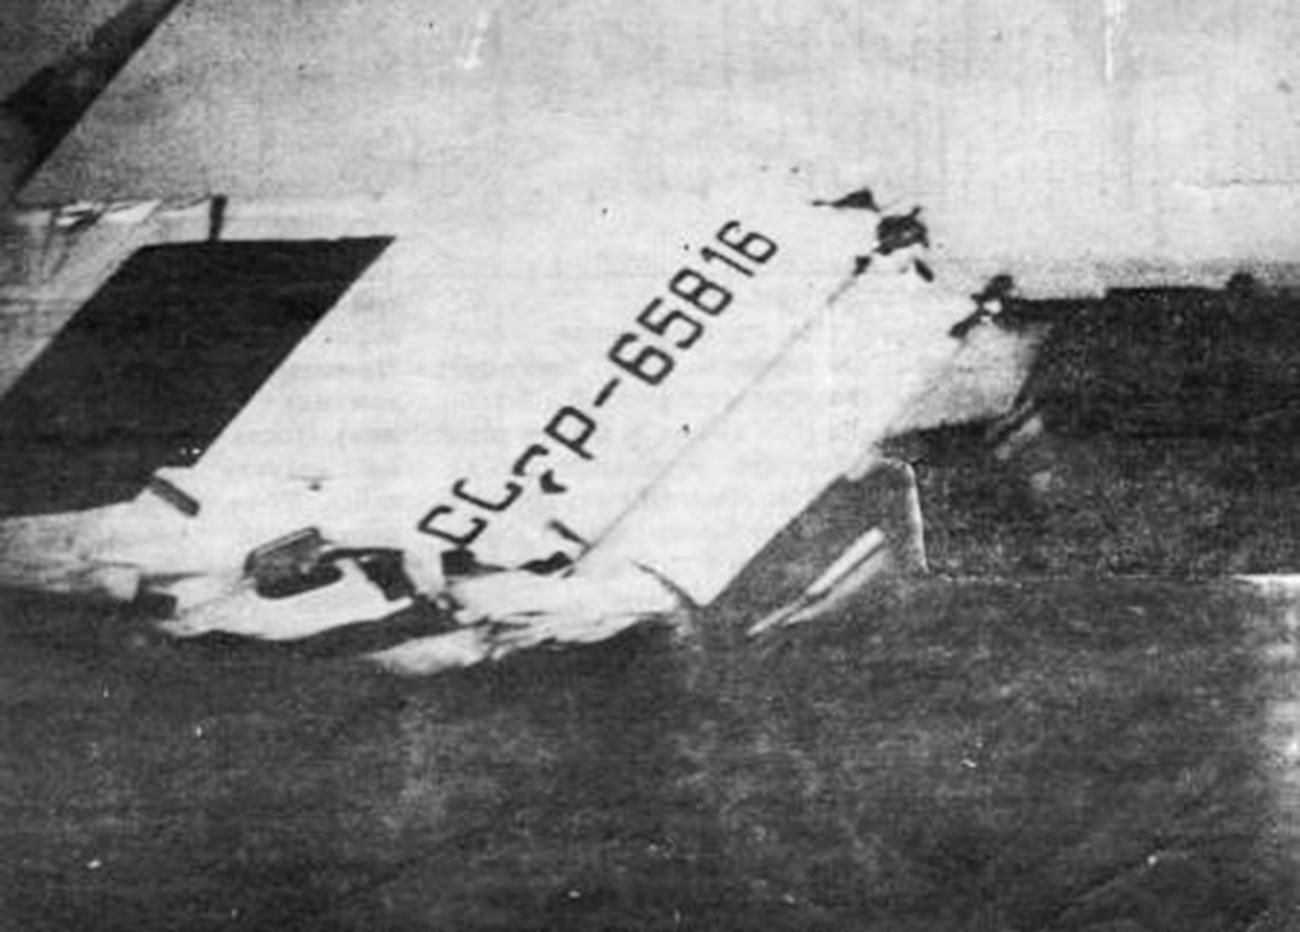 Queue de l'un des deux avions entrés en collision